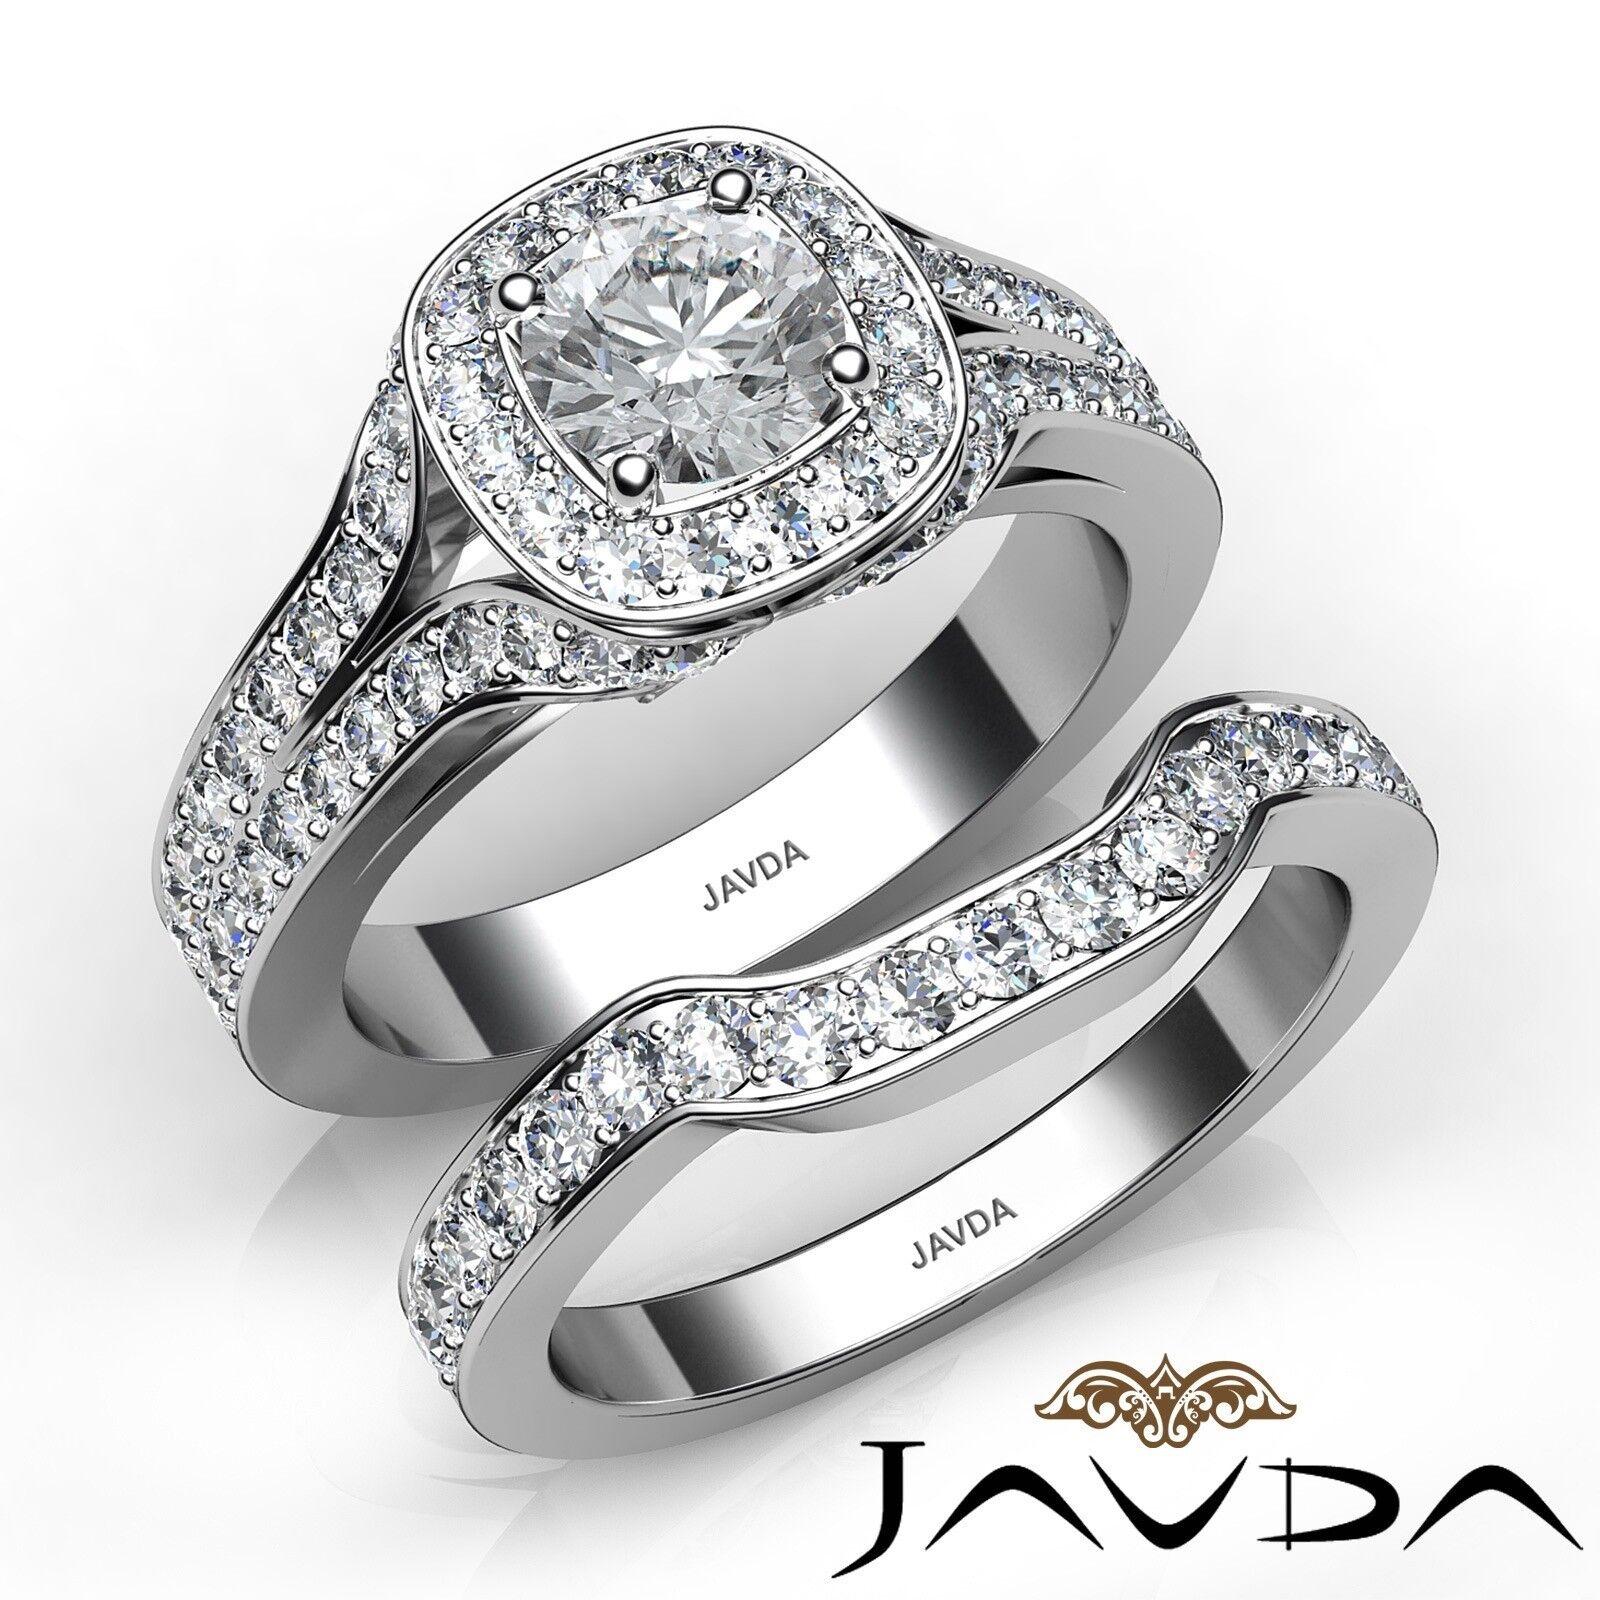 2.37ctw Pave Bridal Set Halo Round Diamond Engagement Ring GIA E-VVS2 White Gold